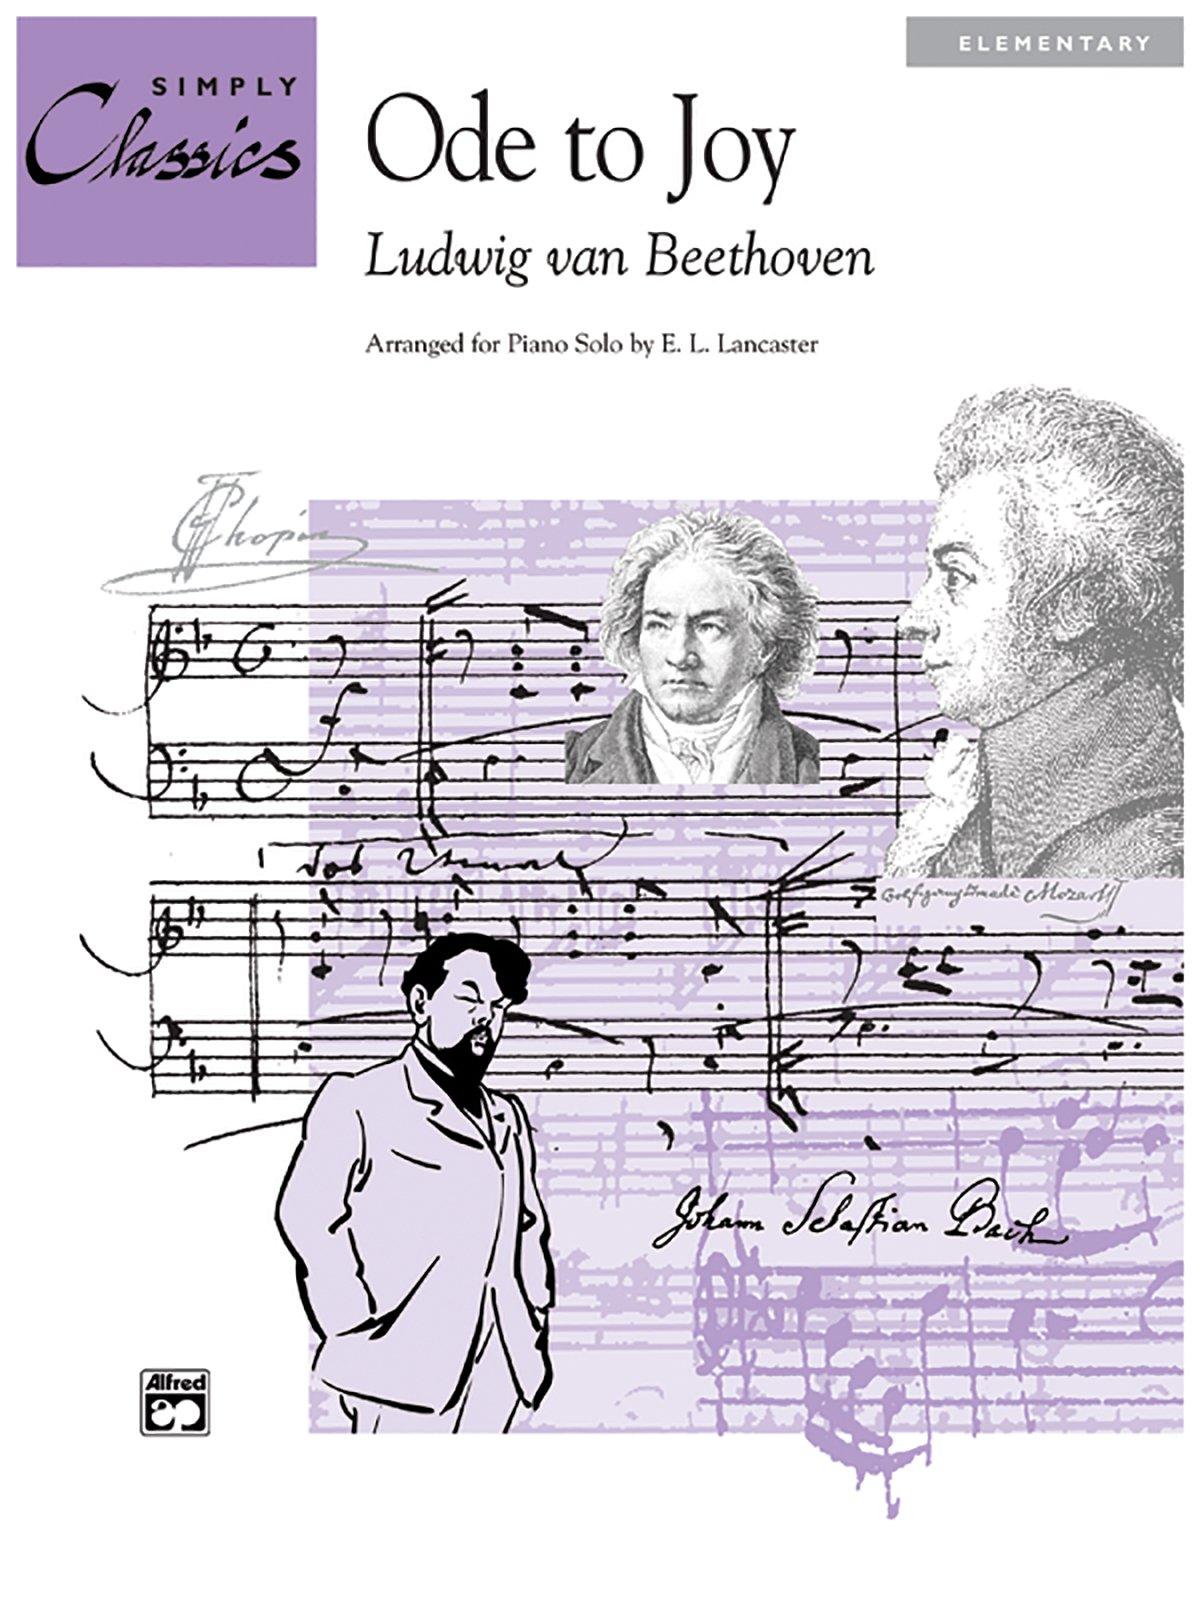 Ode to Joy (Theme from 9th Symphony): Sheet (Simply Classics Solos): Daniel  Dorff, Ludwig Van Beethoven, E. L. Lancaster: 9780739013410: Amazon.com:  Books